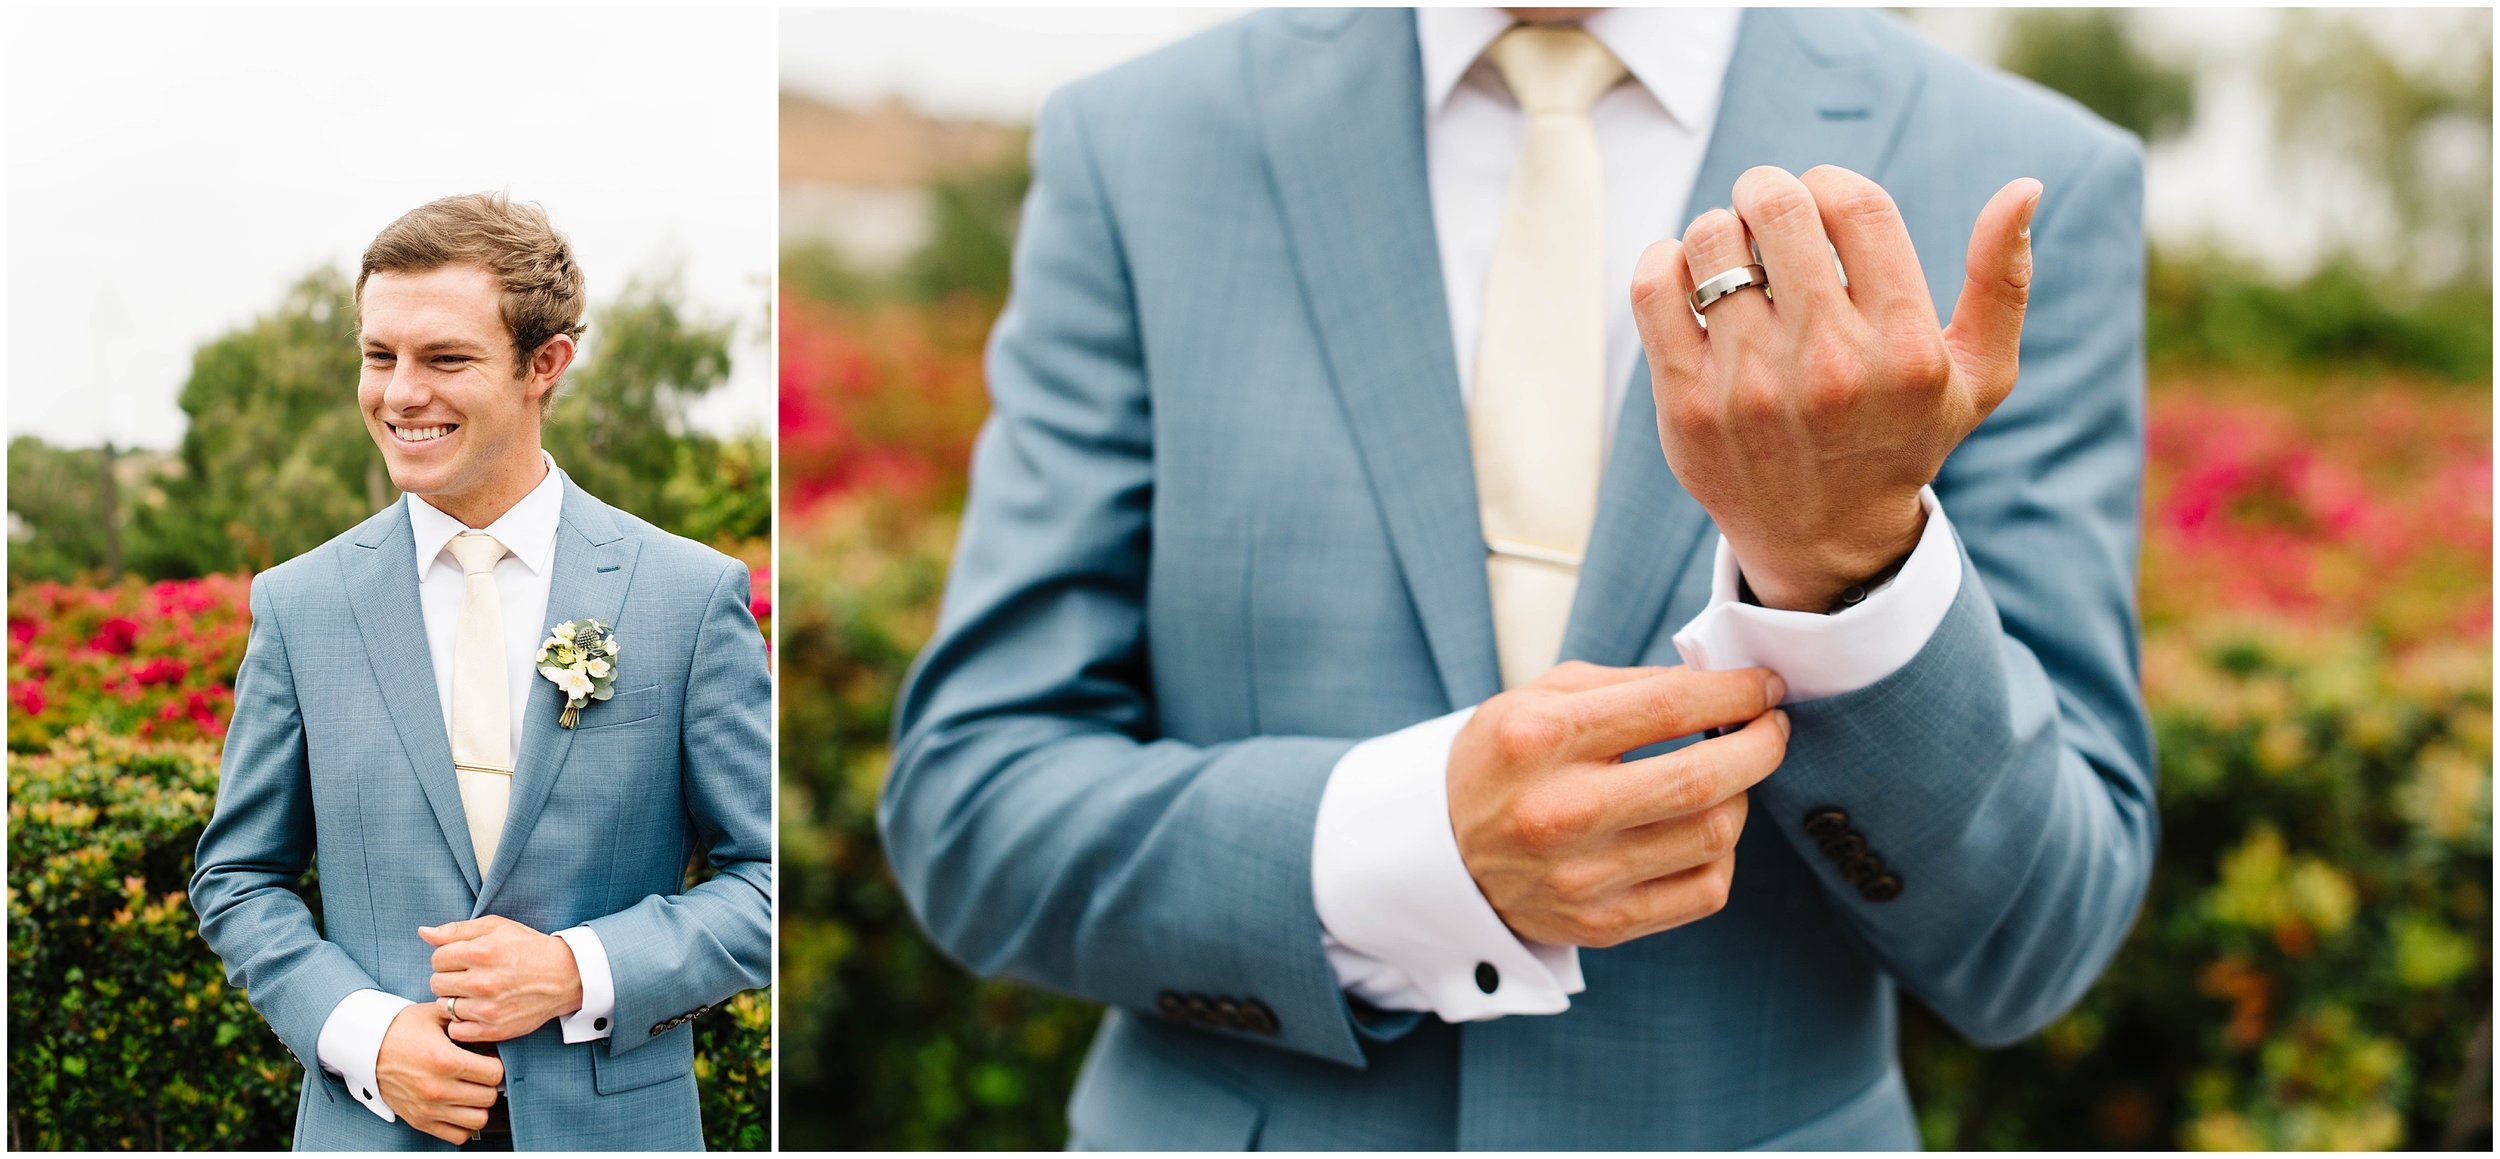 huntington-bay-club-wedding-amber-lynne-photography.jpg33.jpg